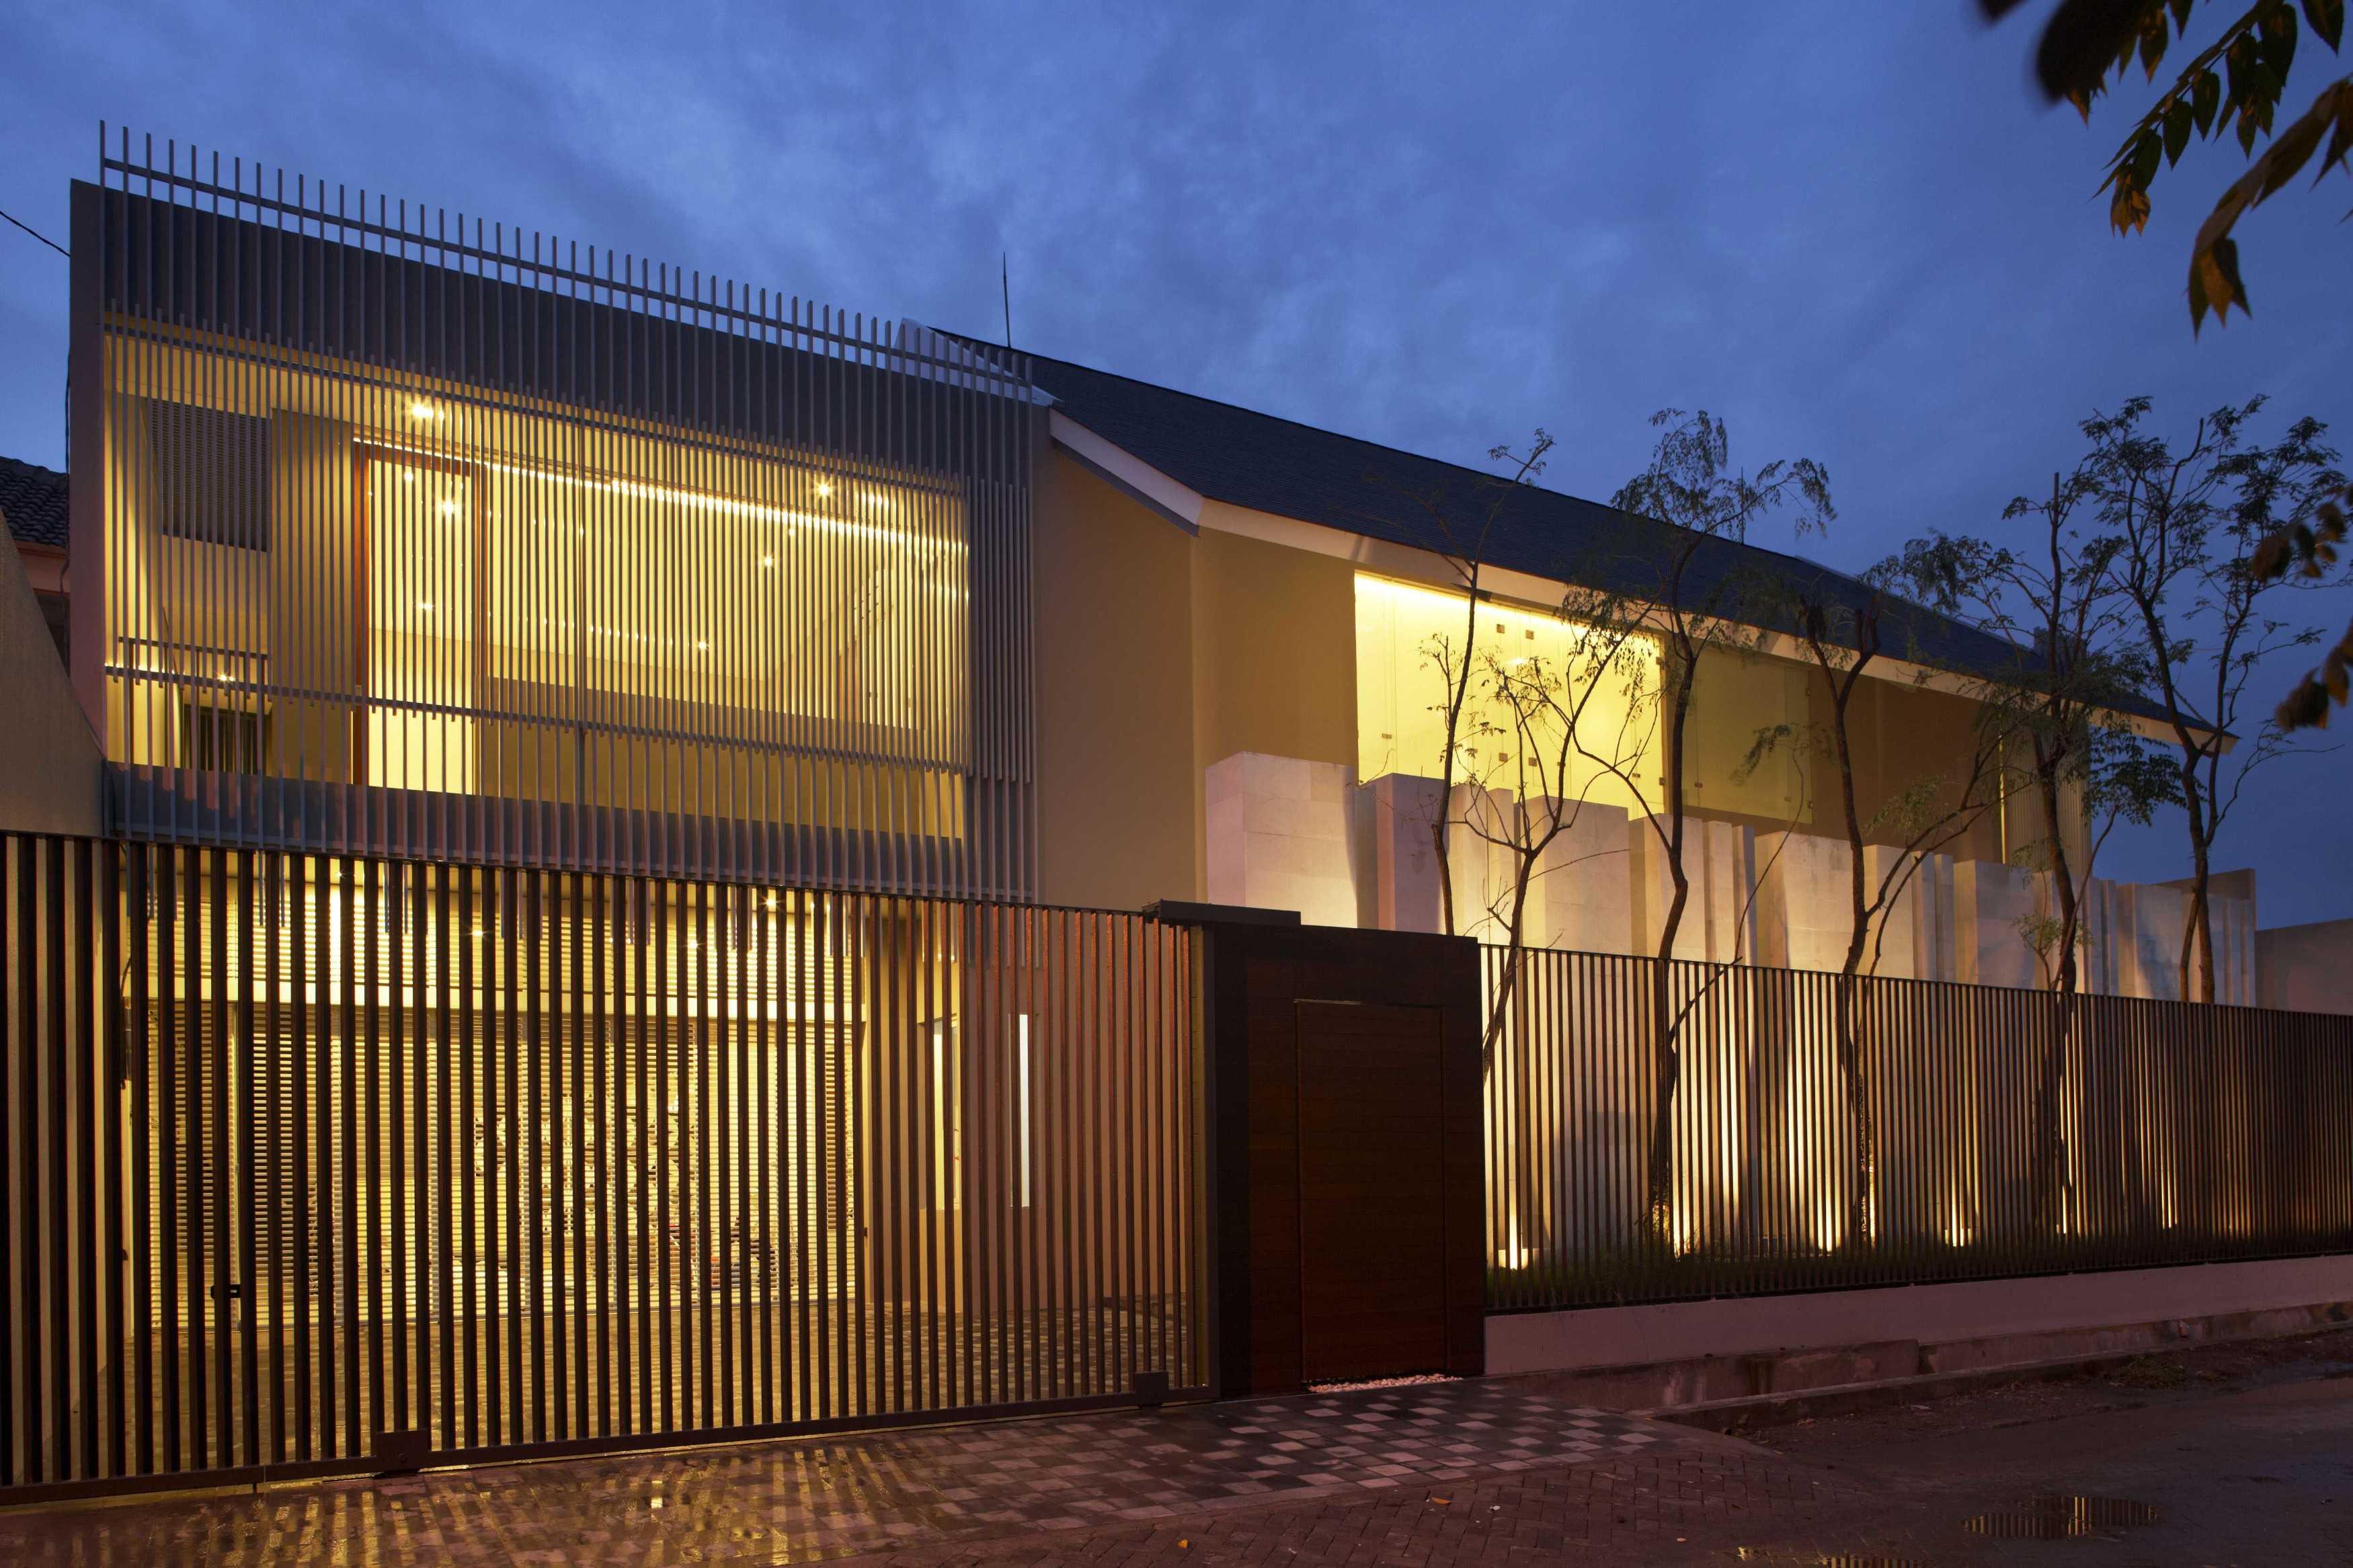 Das Quadrat Kawoeng House Surabaya, Indonesia Surabaya, Indonesia Facade View-Night Modern  9360